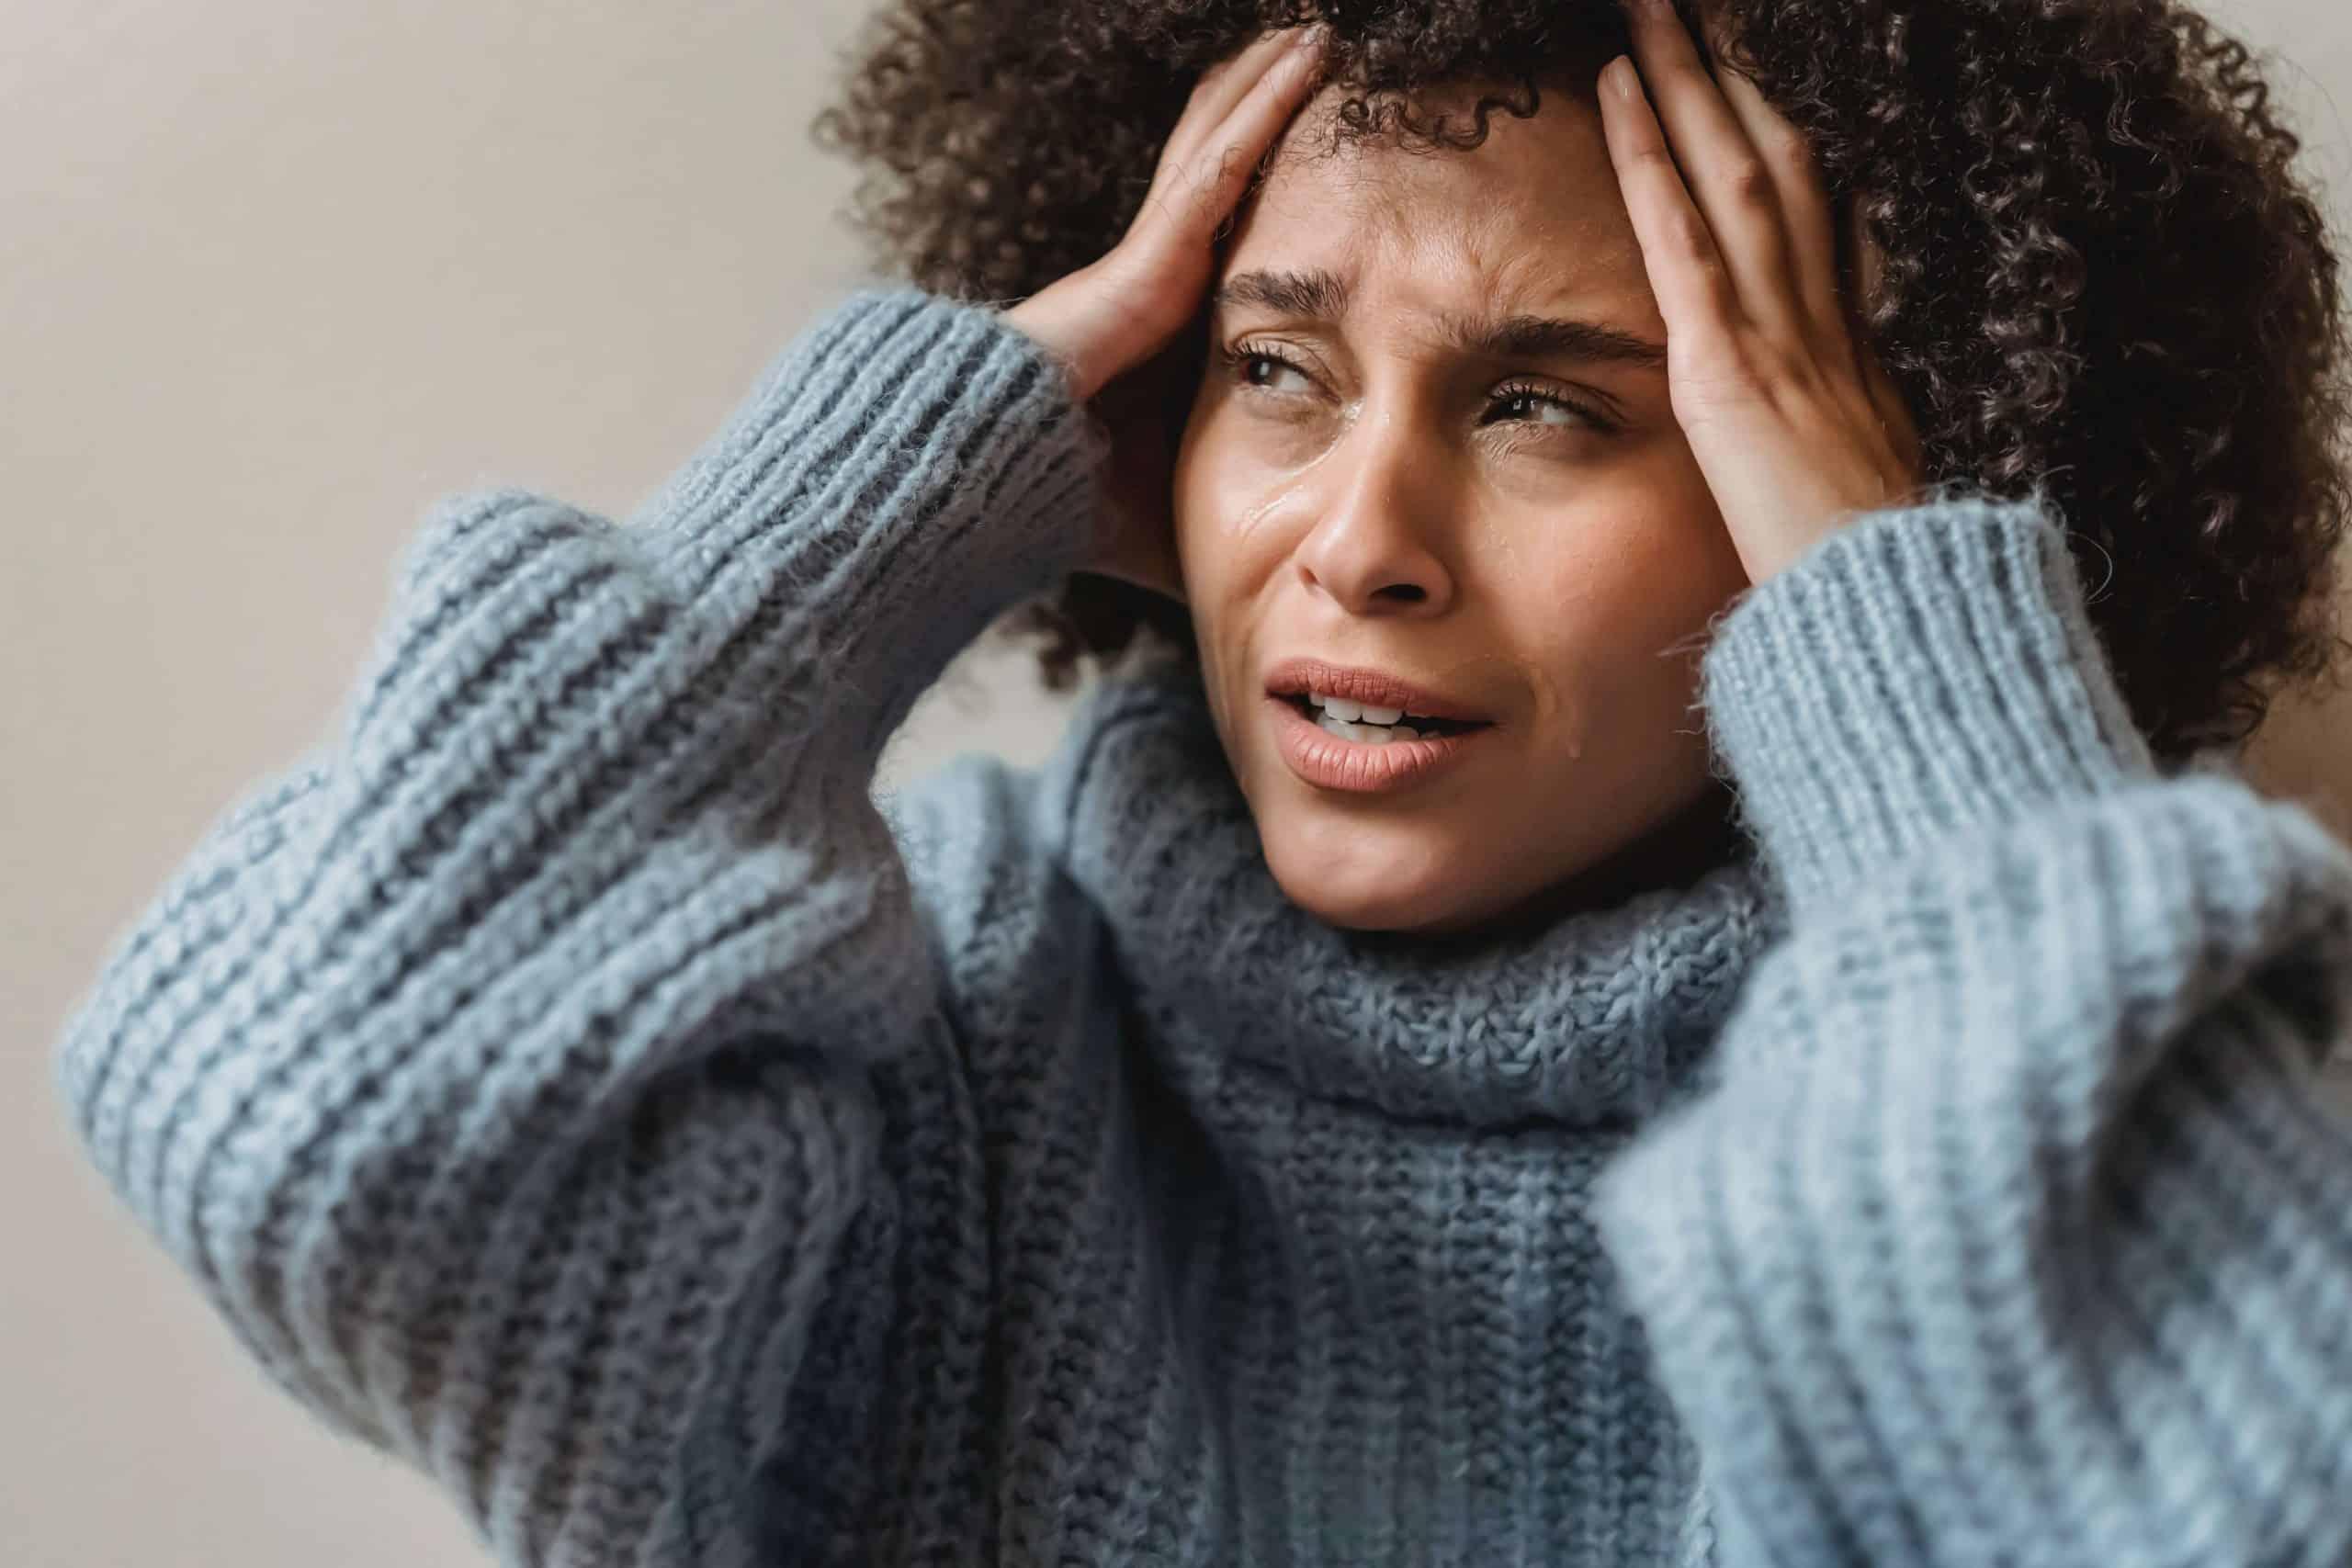 controlar-crise-ansiedade